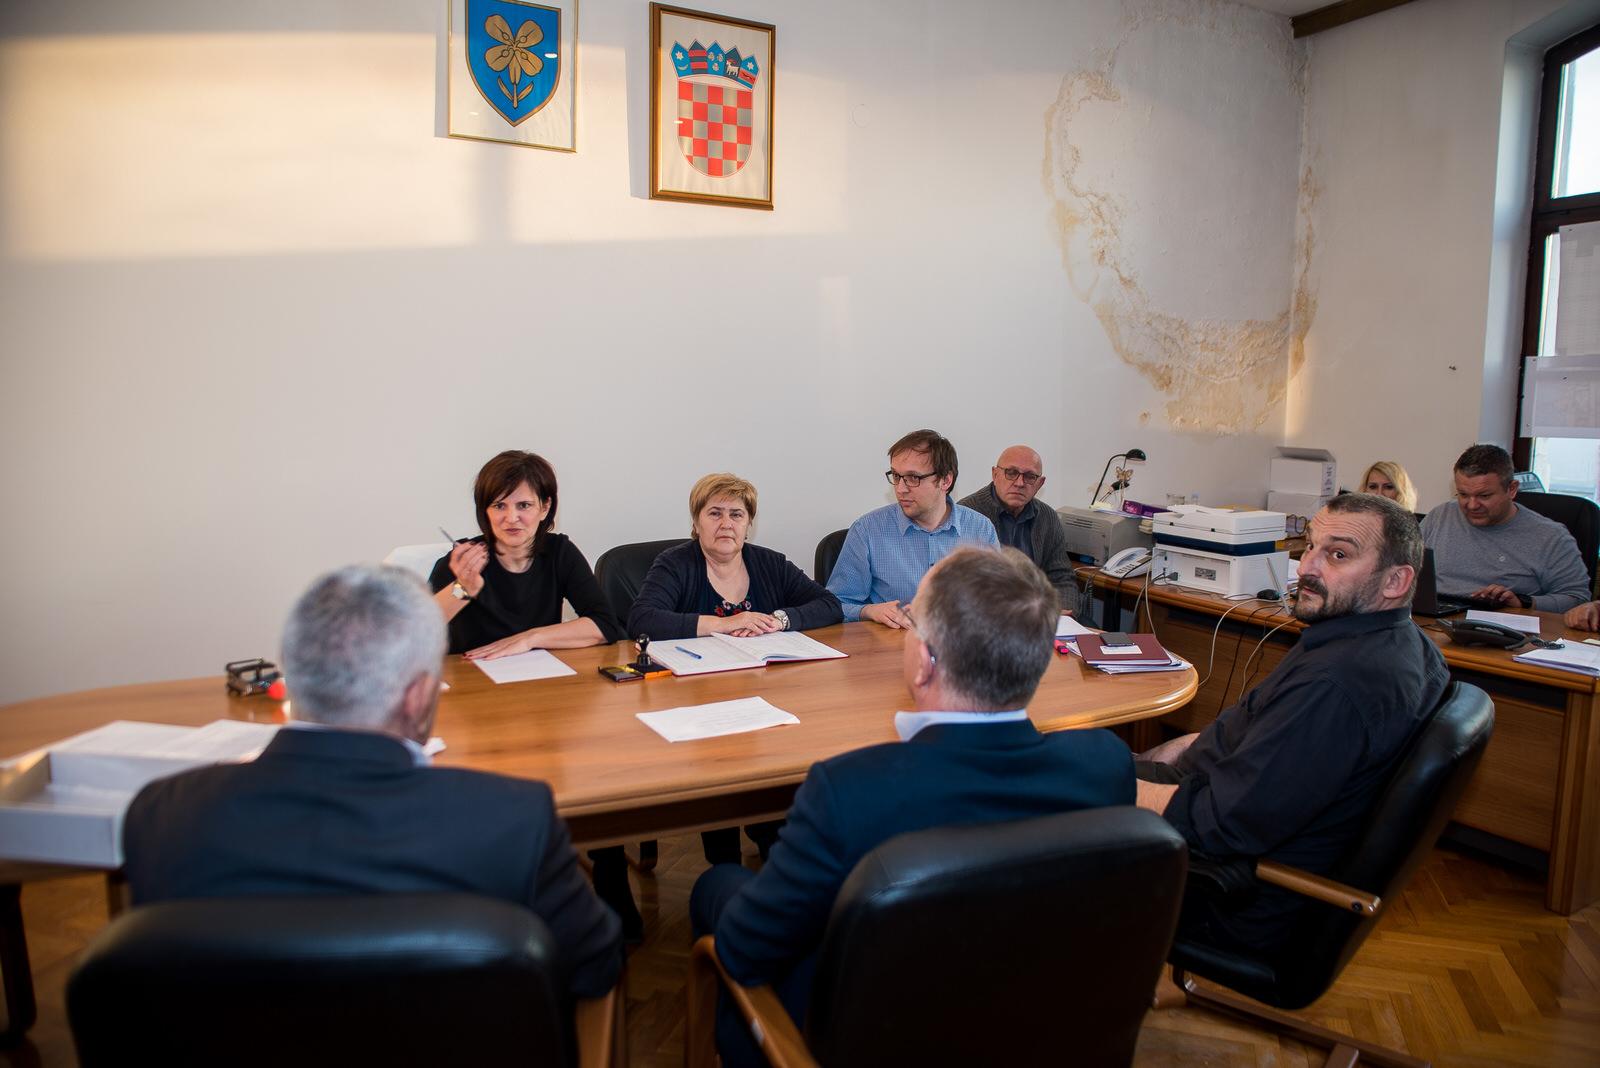 likaclub_politika-gospić_2019_bura-promjena-13